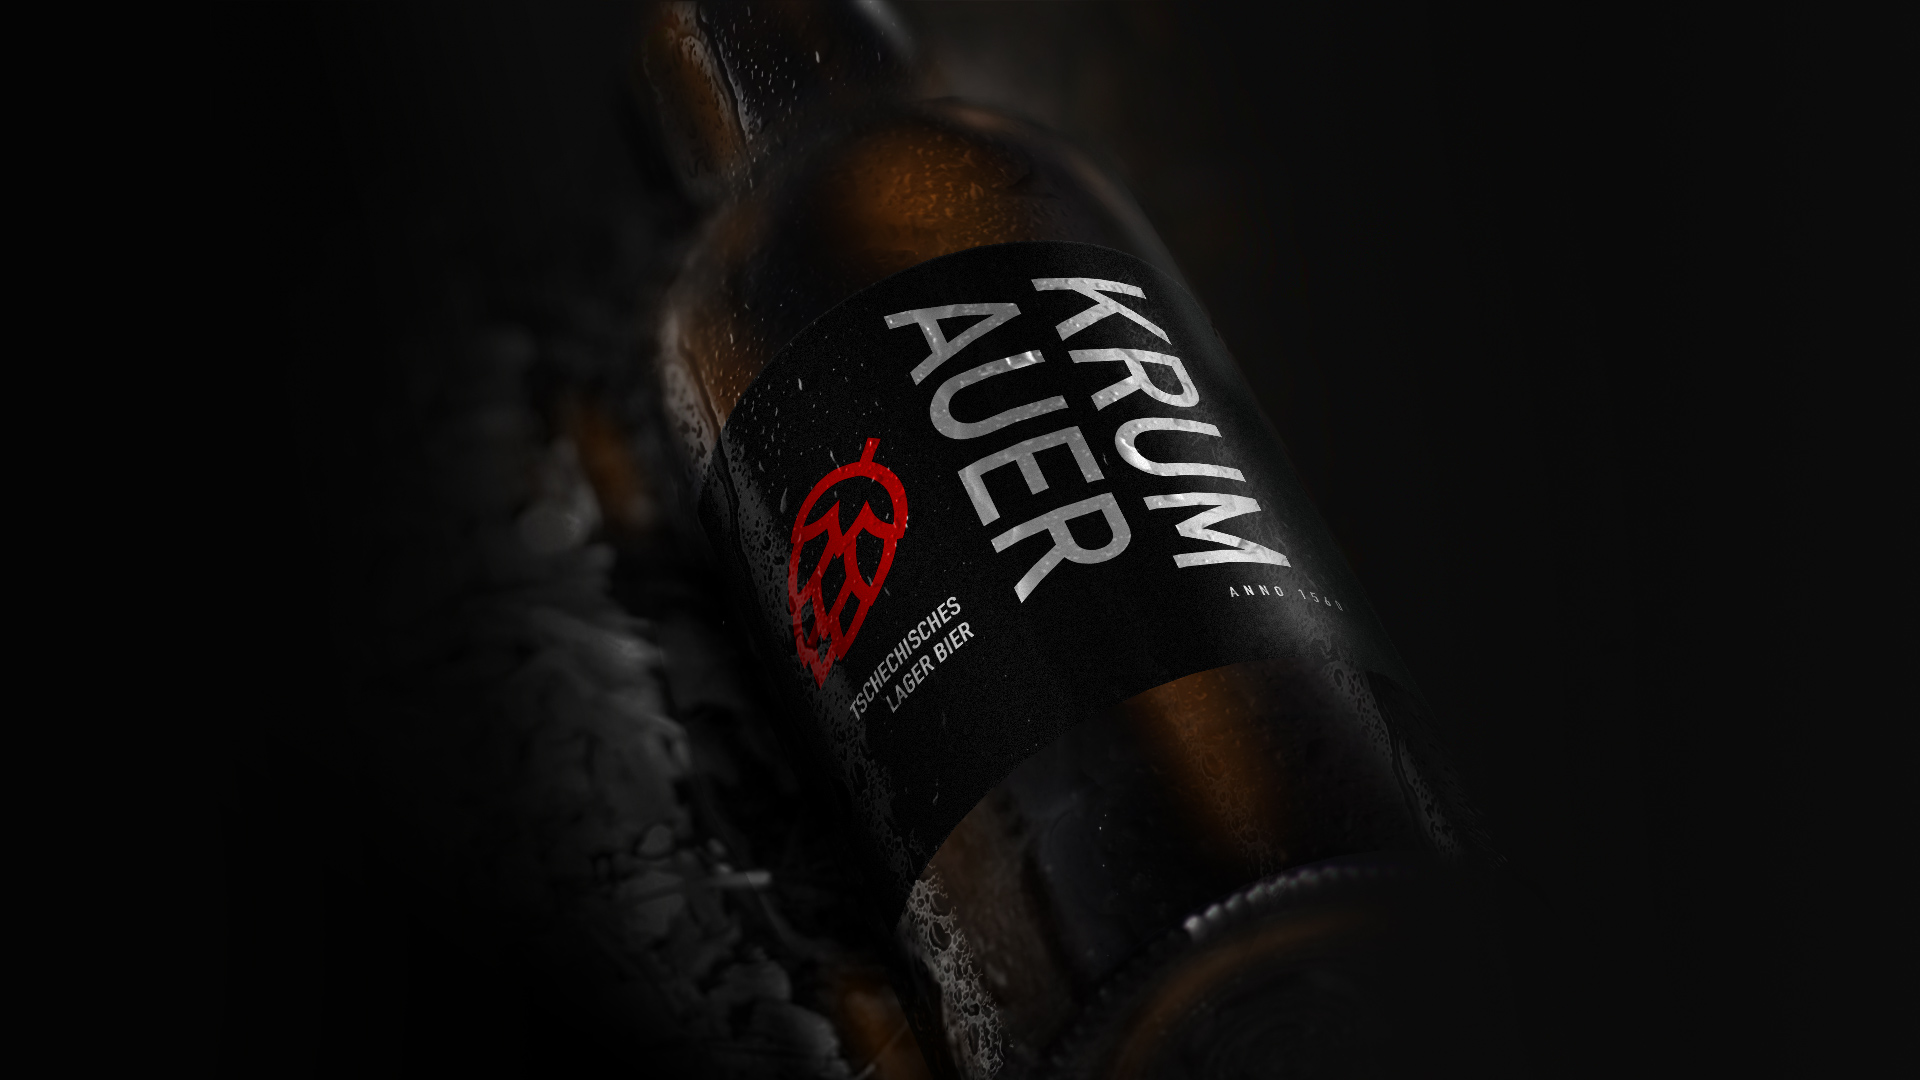 Branding Krumauer Bier